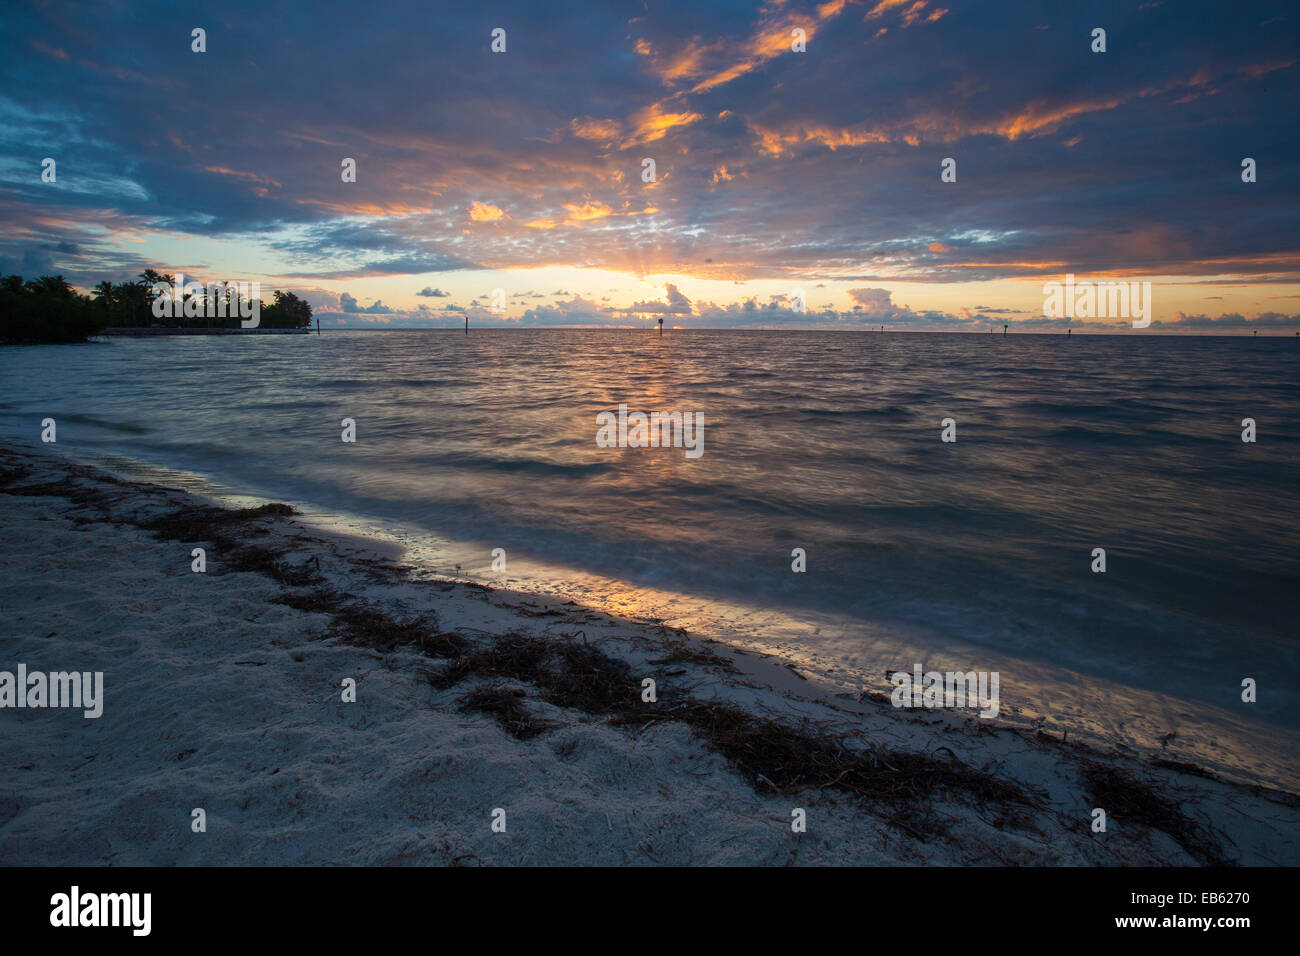 Curry Hammock State Park at sunrise, Little Crawl Key, Florida, USA. Stock Photo